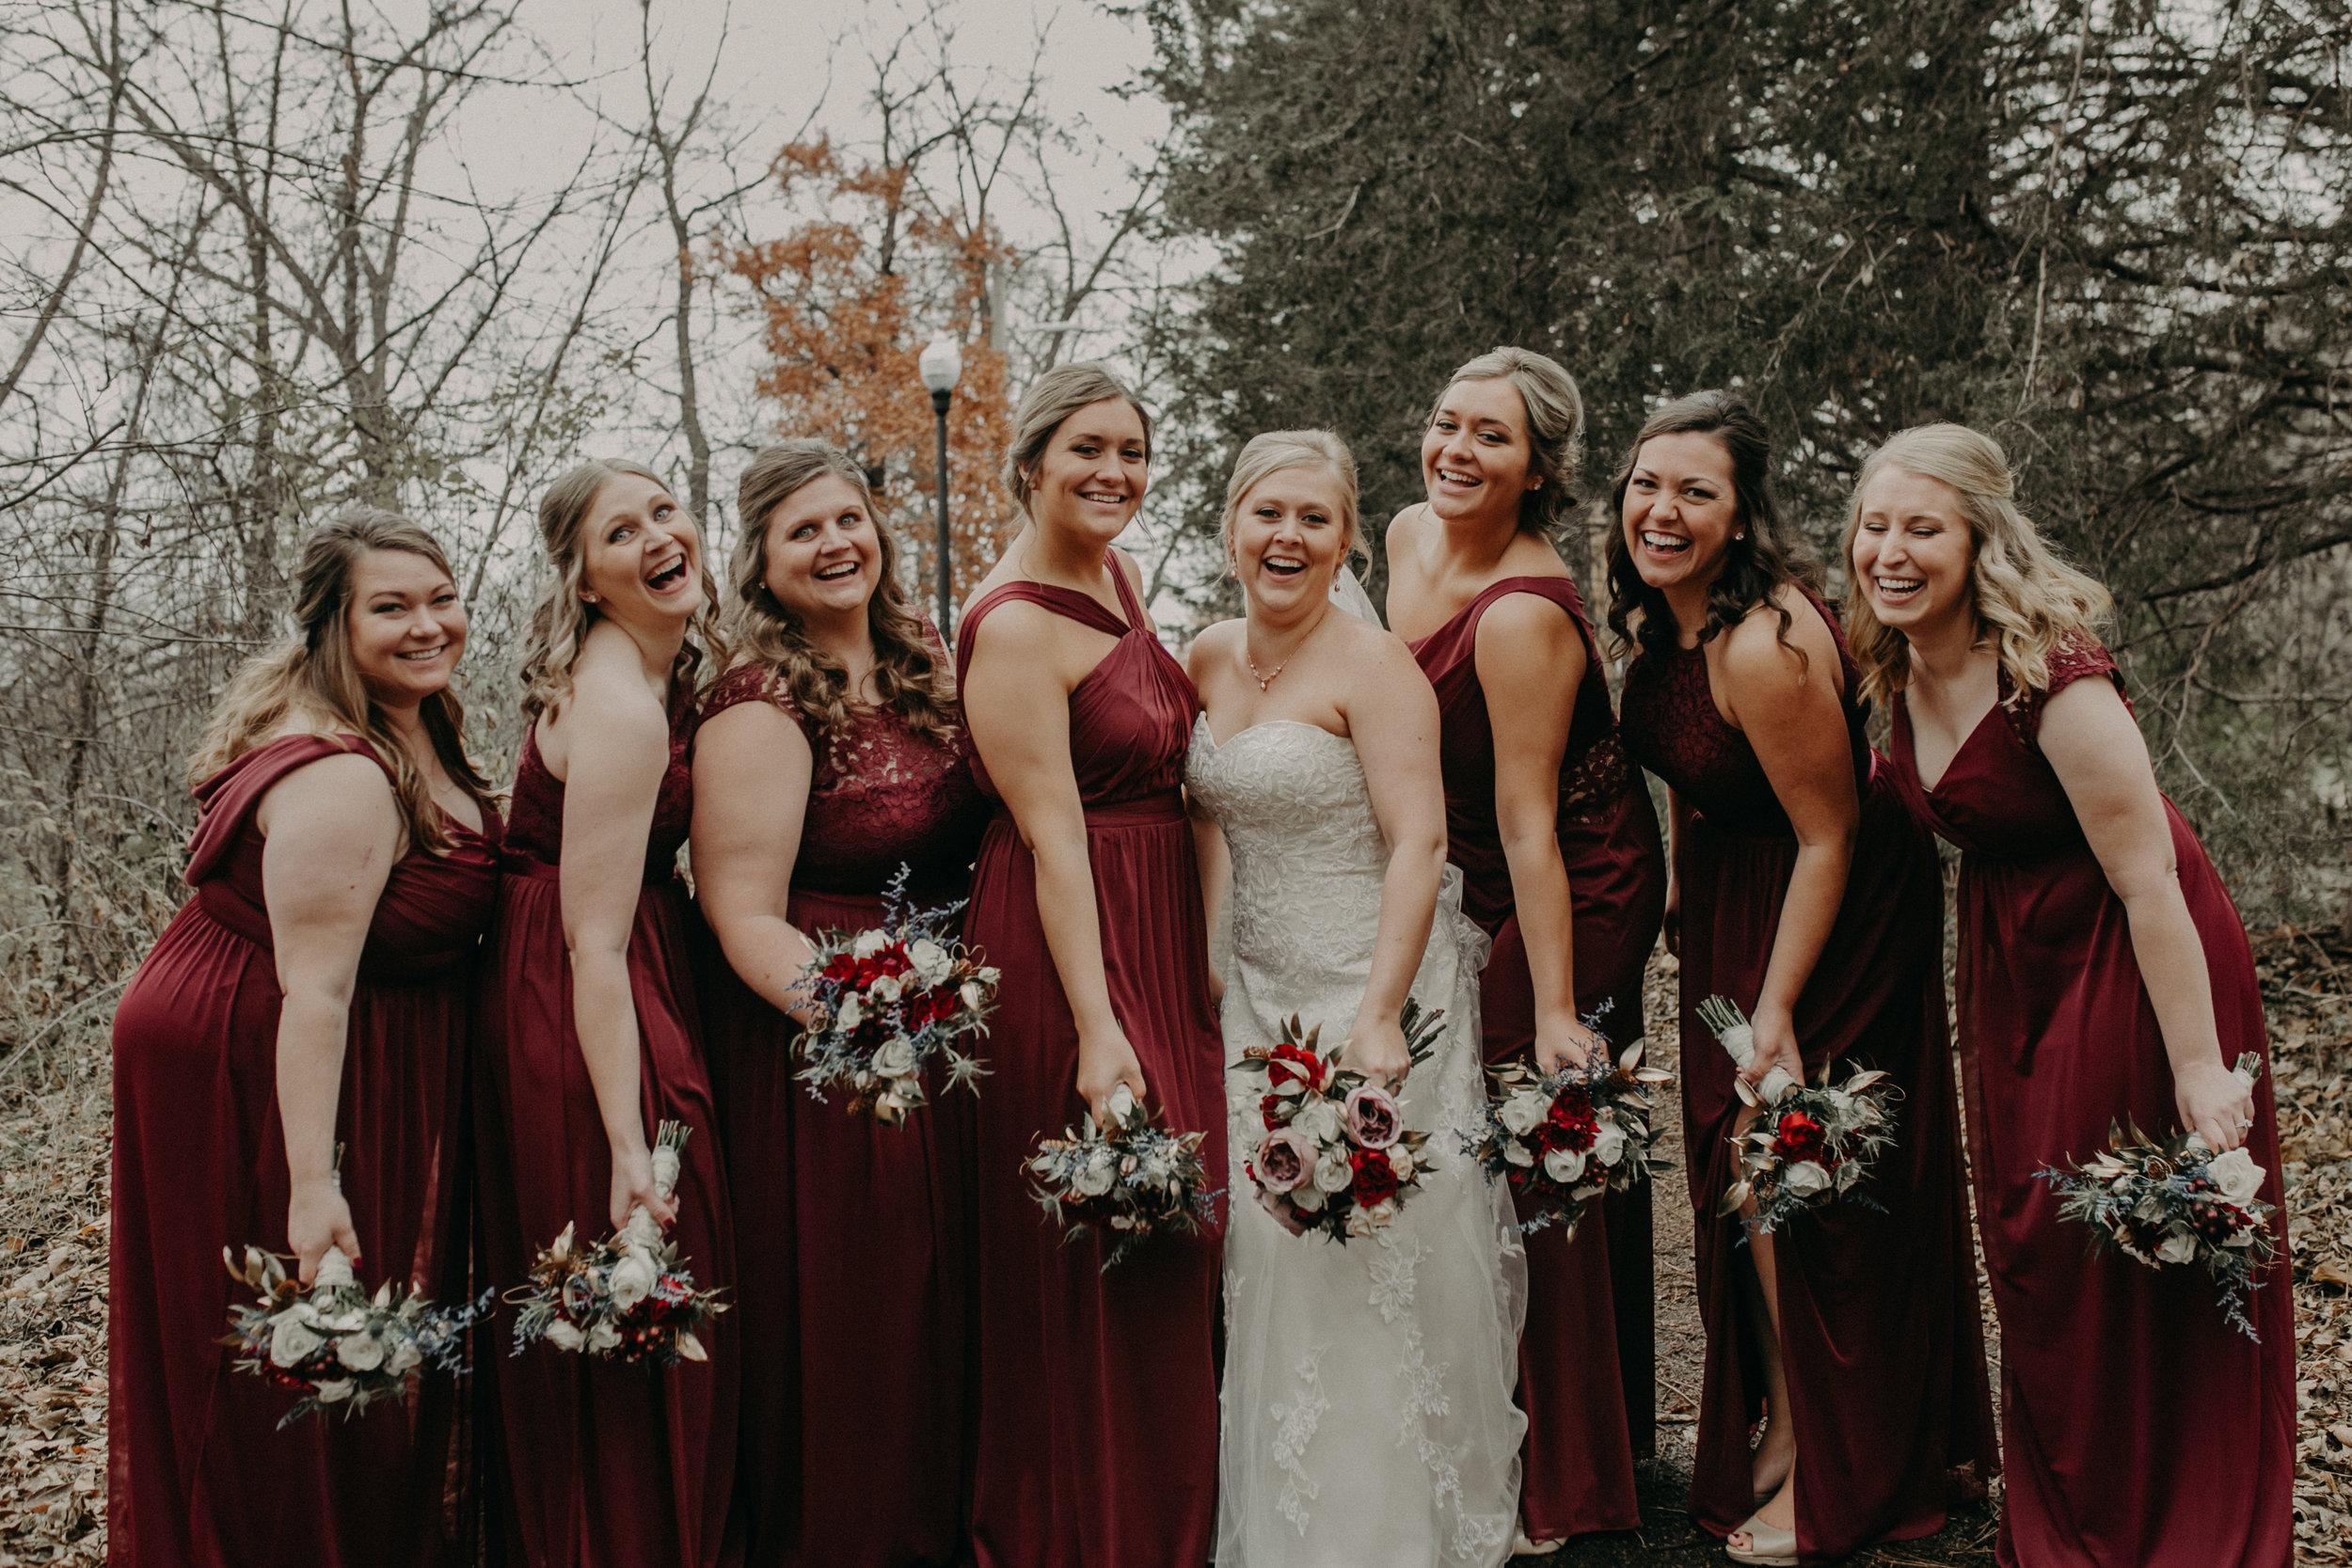 Weisenbeck_Wedding_Oct2018-474.jpg